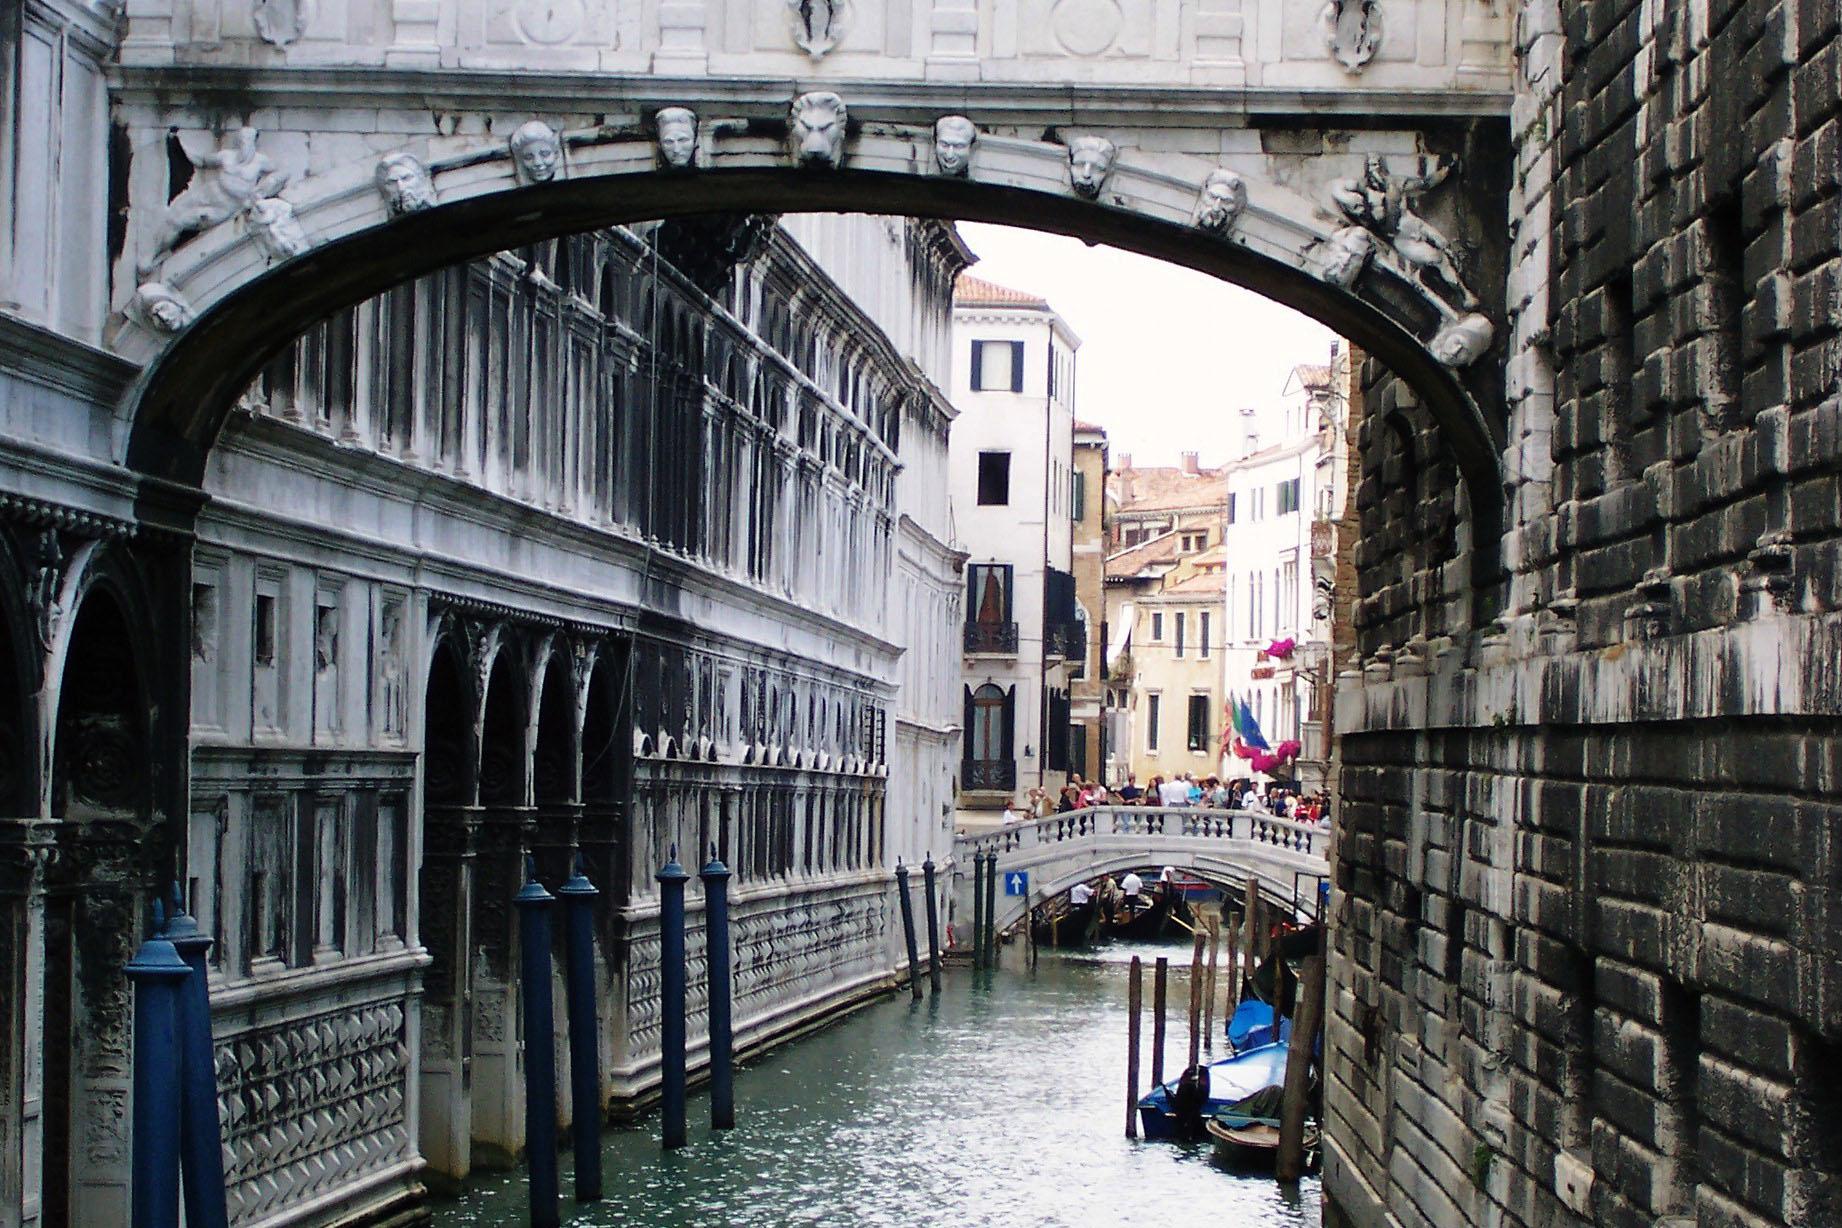 Arhitektura koja spaja ljude - Mostovi The-Ponte-dei-Sospiri-the-Bridge-of-Sighs-Venice-Italy-02